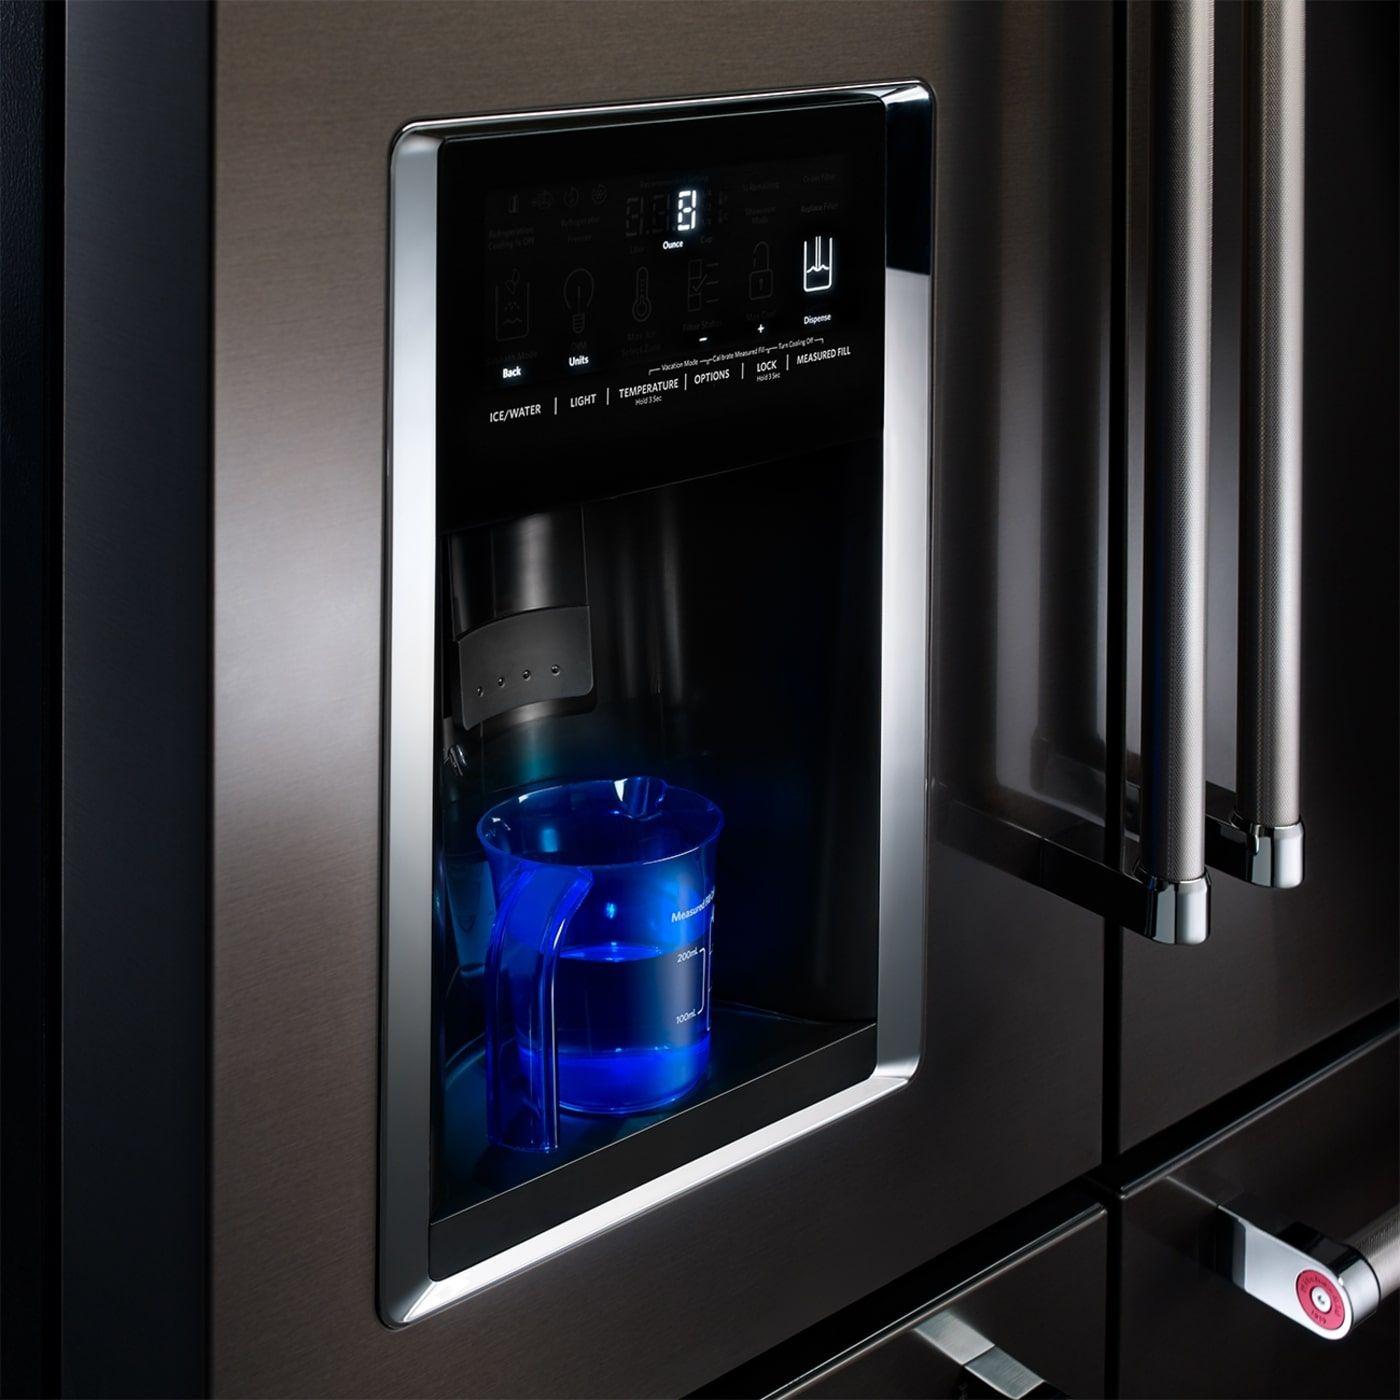 Krmf706ebs by kitchenaid french door refrigerators